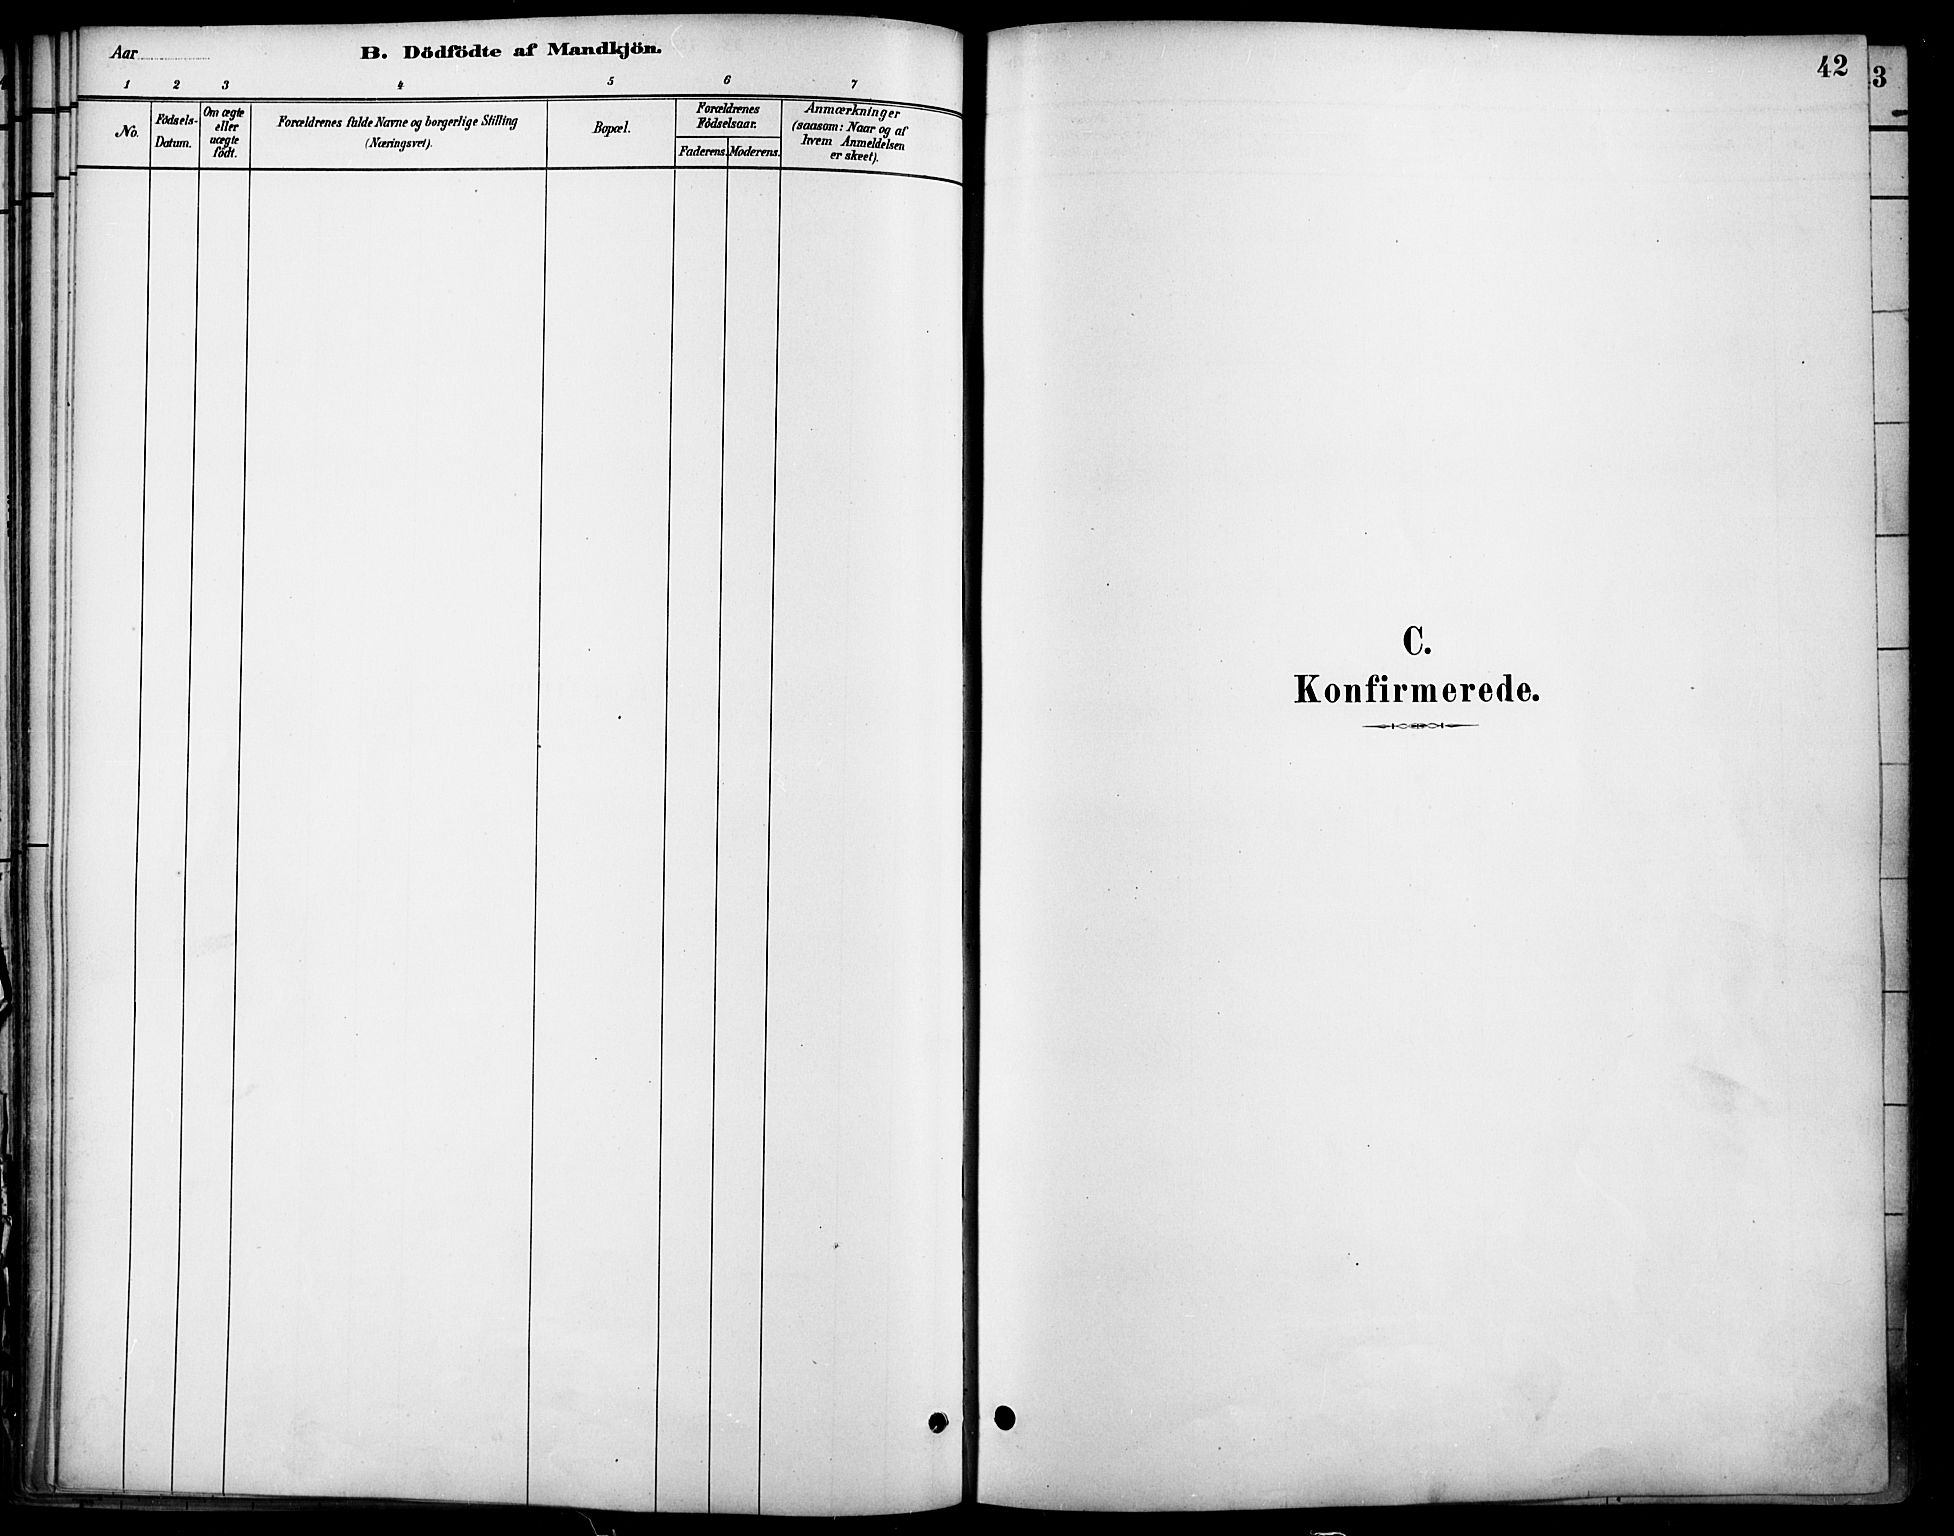 SAO, Nannestad prestekontor Kirkebøker, F/Fa/L0014: Ministerialbok nr. I 14, 1881-1890, s. 42